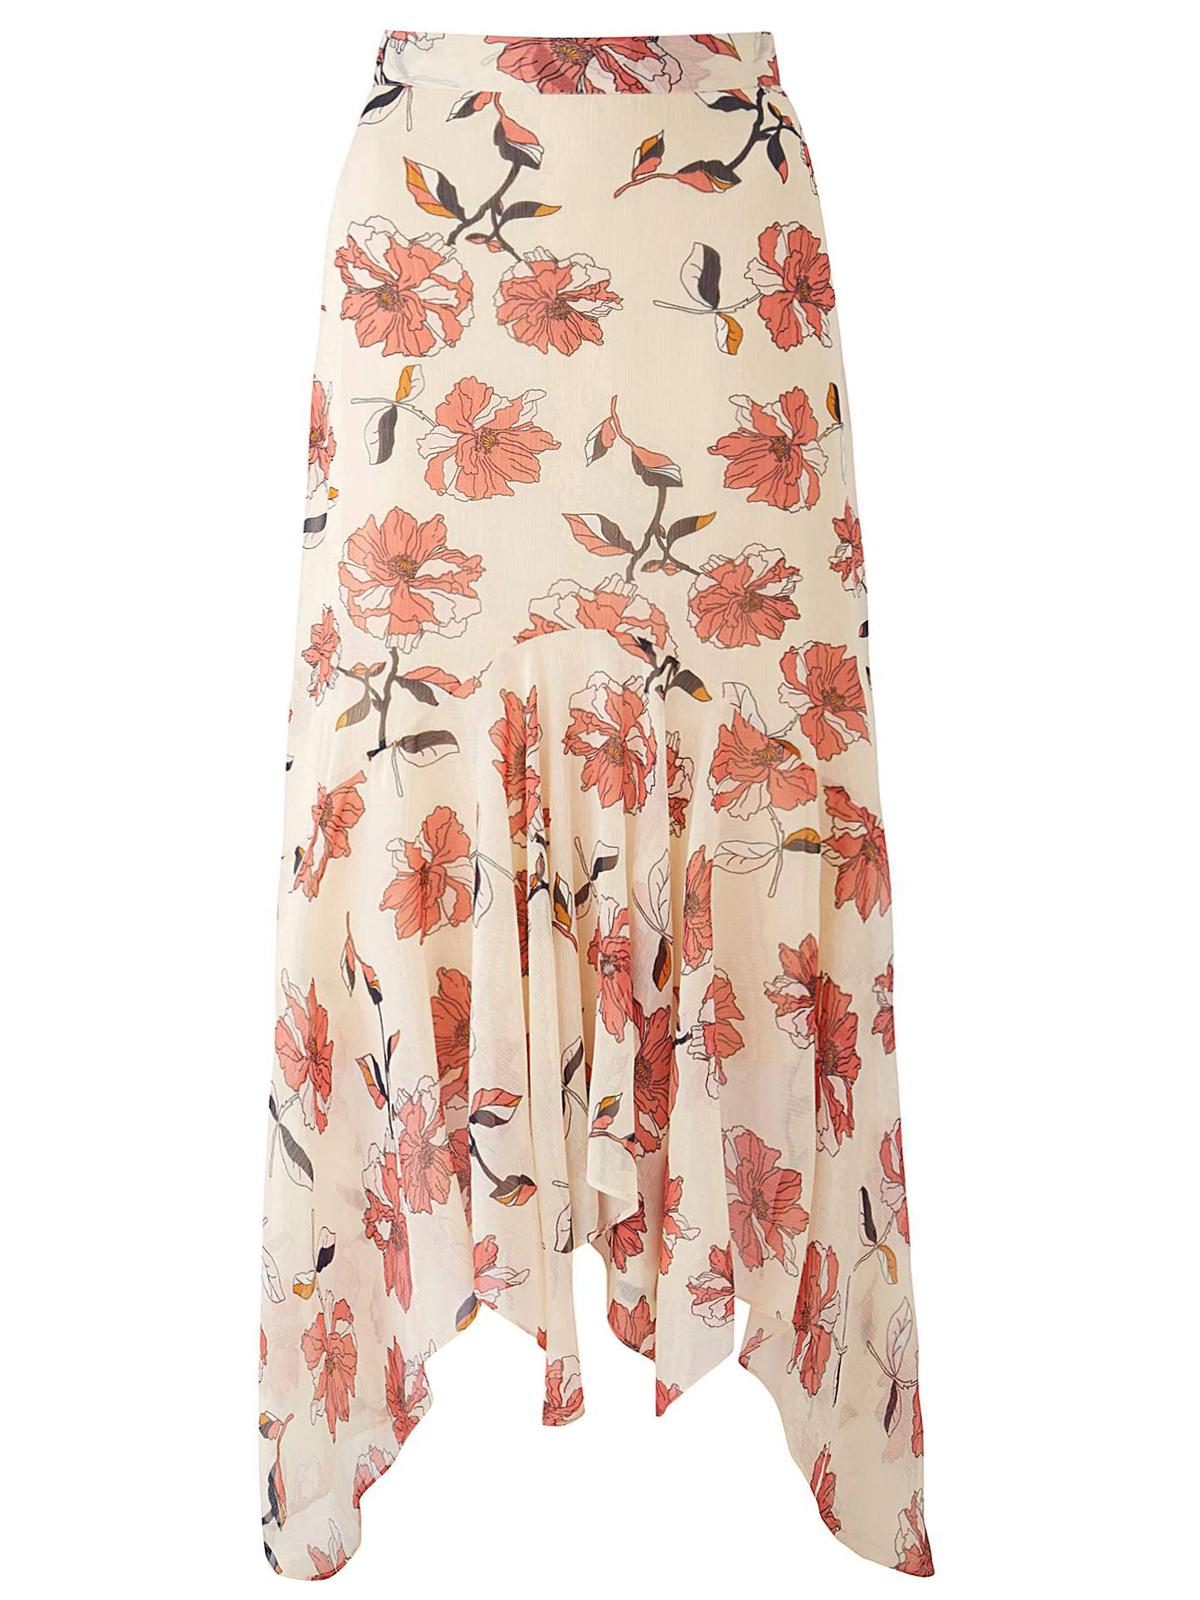 7b05ccc31b8 Joanna Hope - - Joanna Hope CREAM Floral Print Layered Skirt - Plus Size 22  to 32